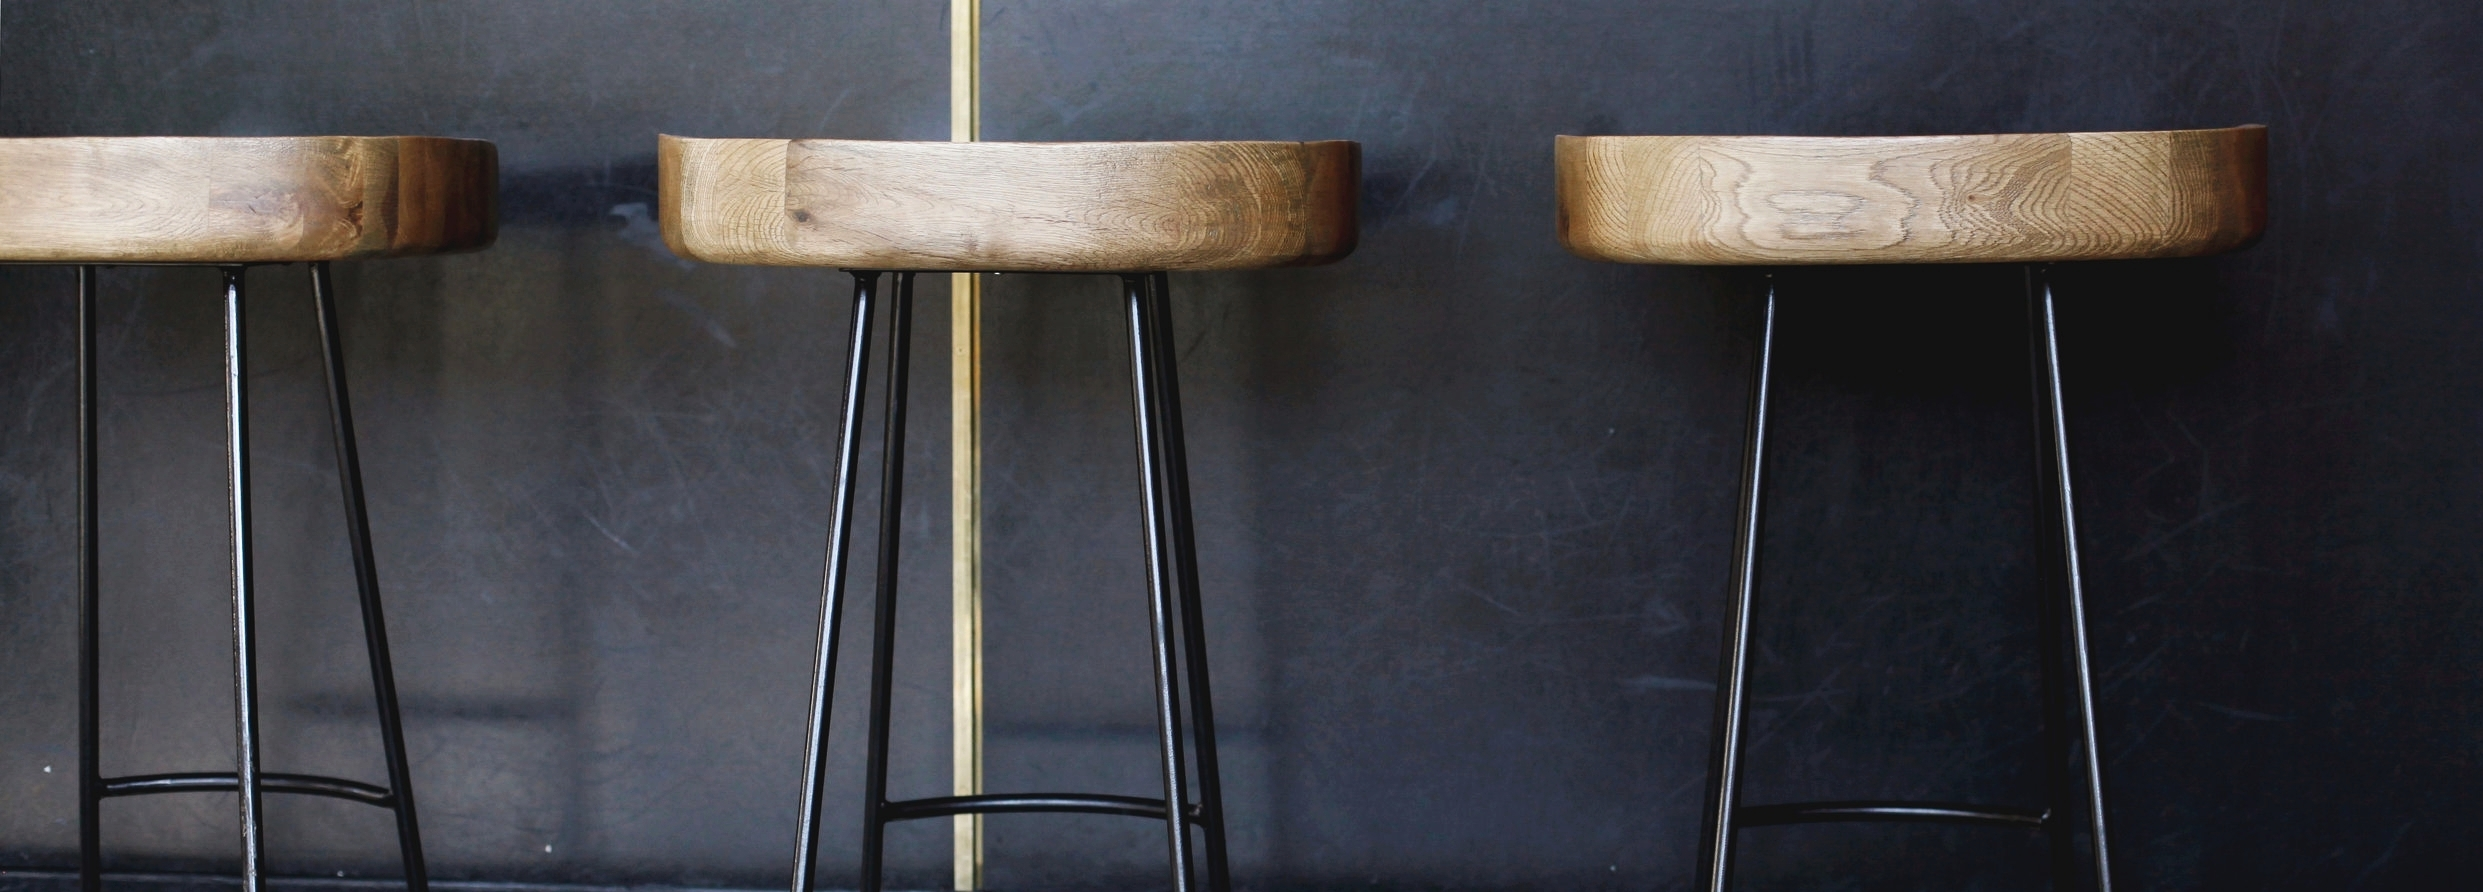 bar_stools.jpg